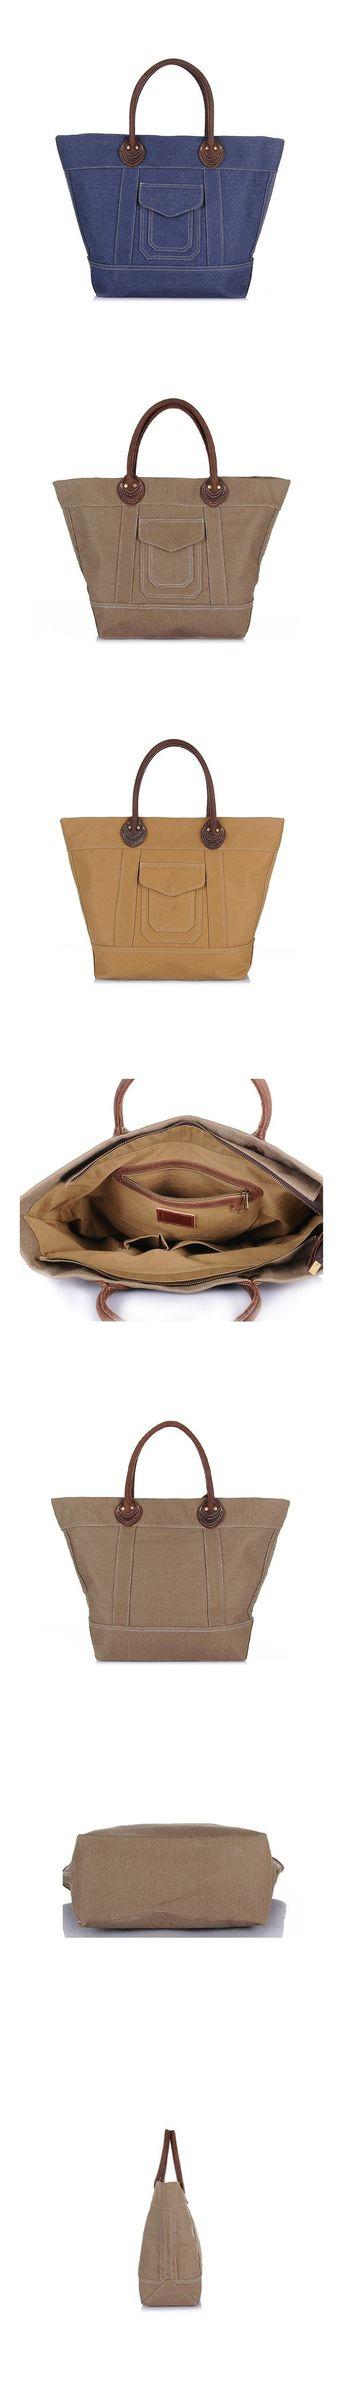 Retro Canvas Men Tote Bag Leather With Canvas Men Travel Shoulder Bag Men  Daily Use Canvas 4d7068acb86be